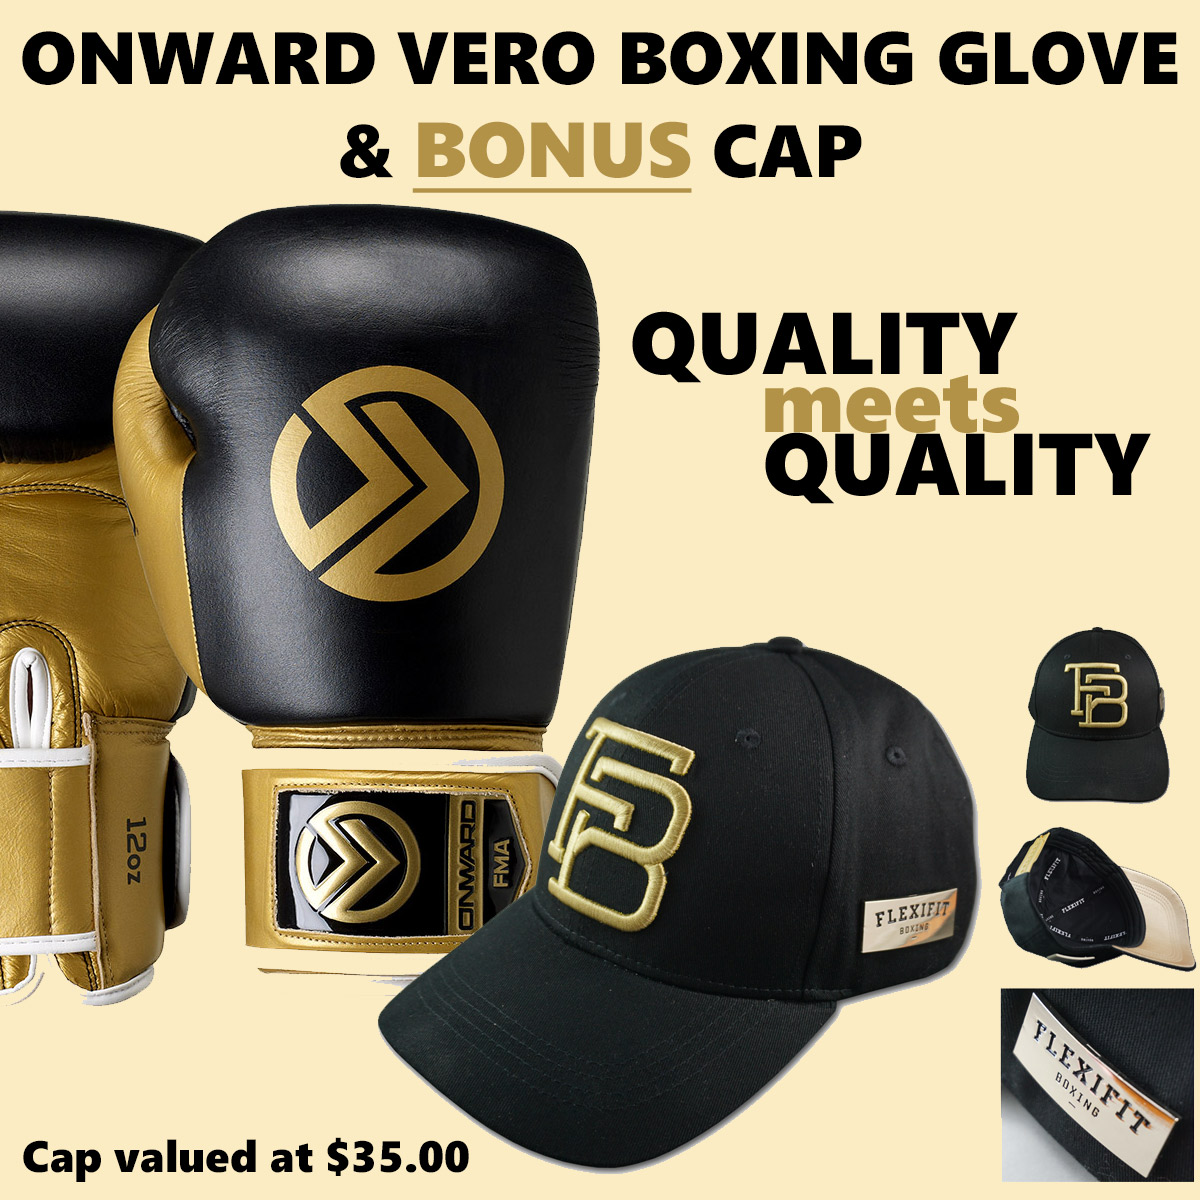 Shiv Naresh Teens Boxing Gloves 12oz: Onward Vero Boxing Glove